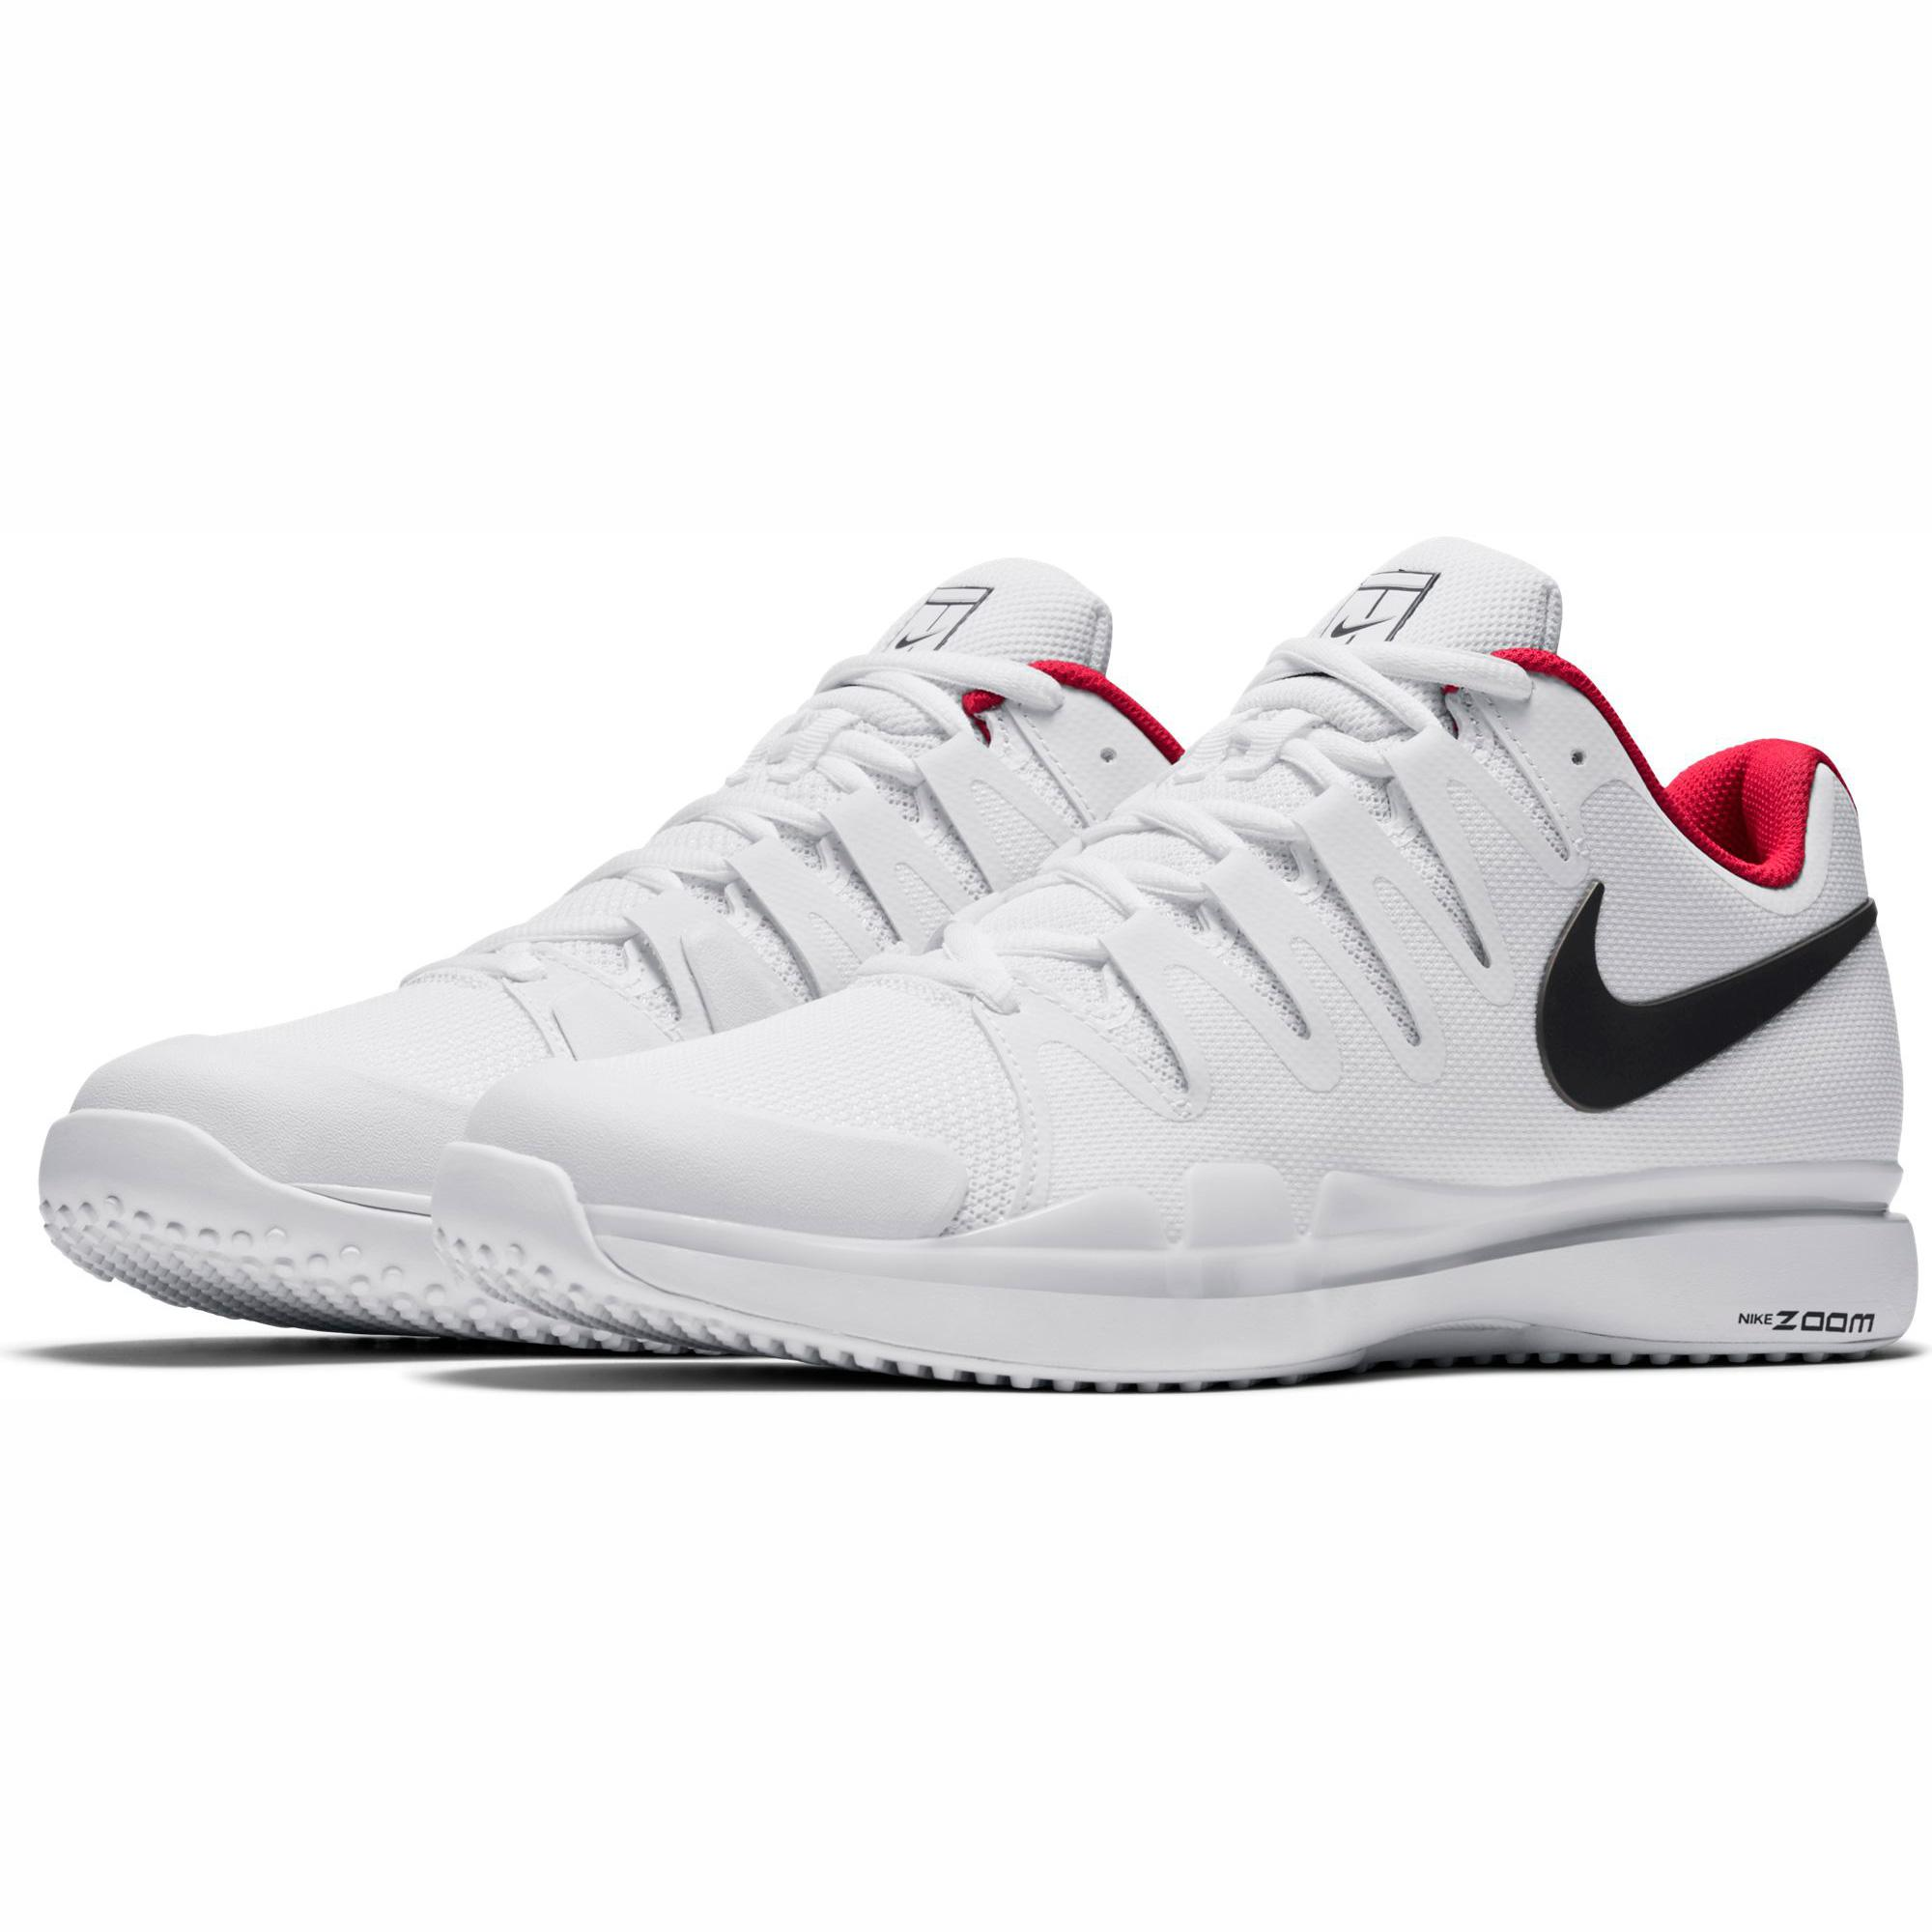 649084 106 Weiß Nike Court Zoom Vapor 9.5 Tour Grass